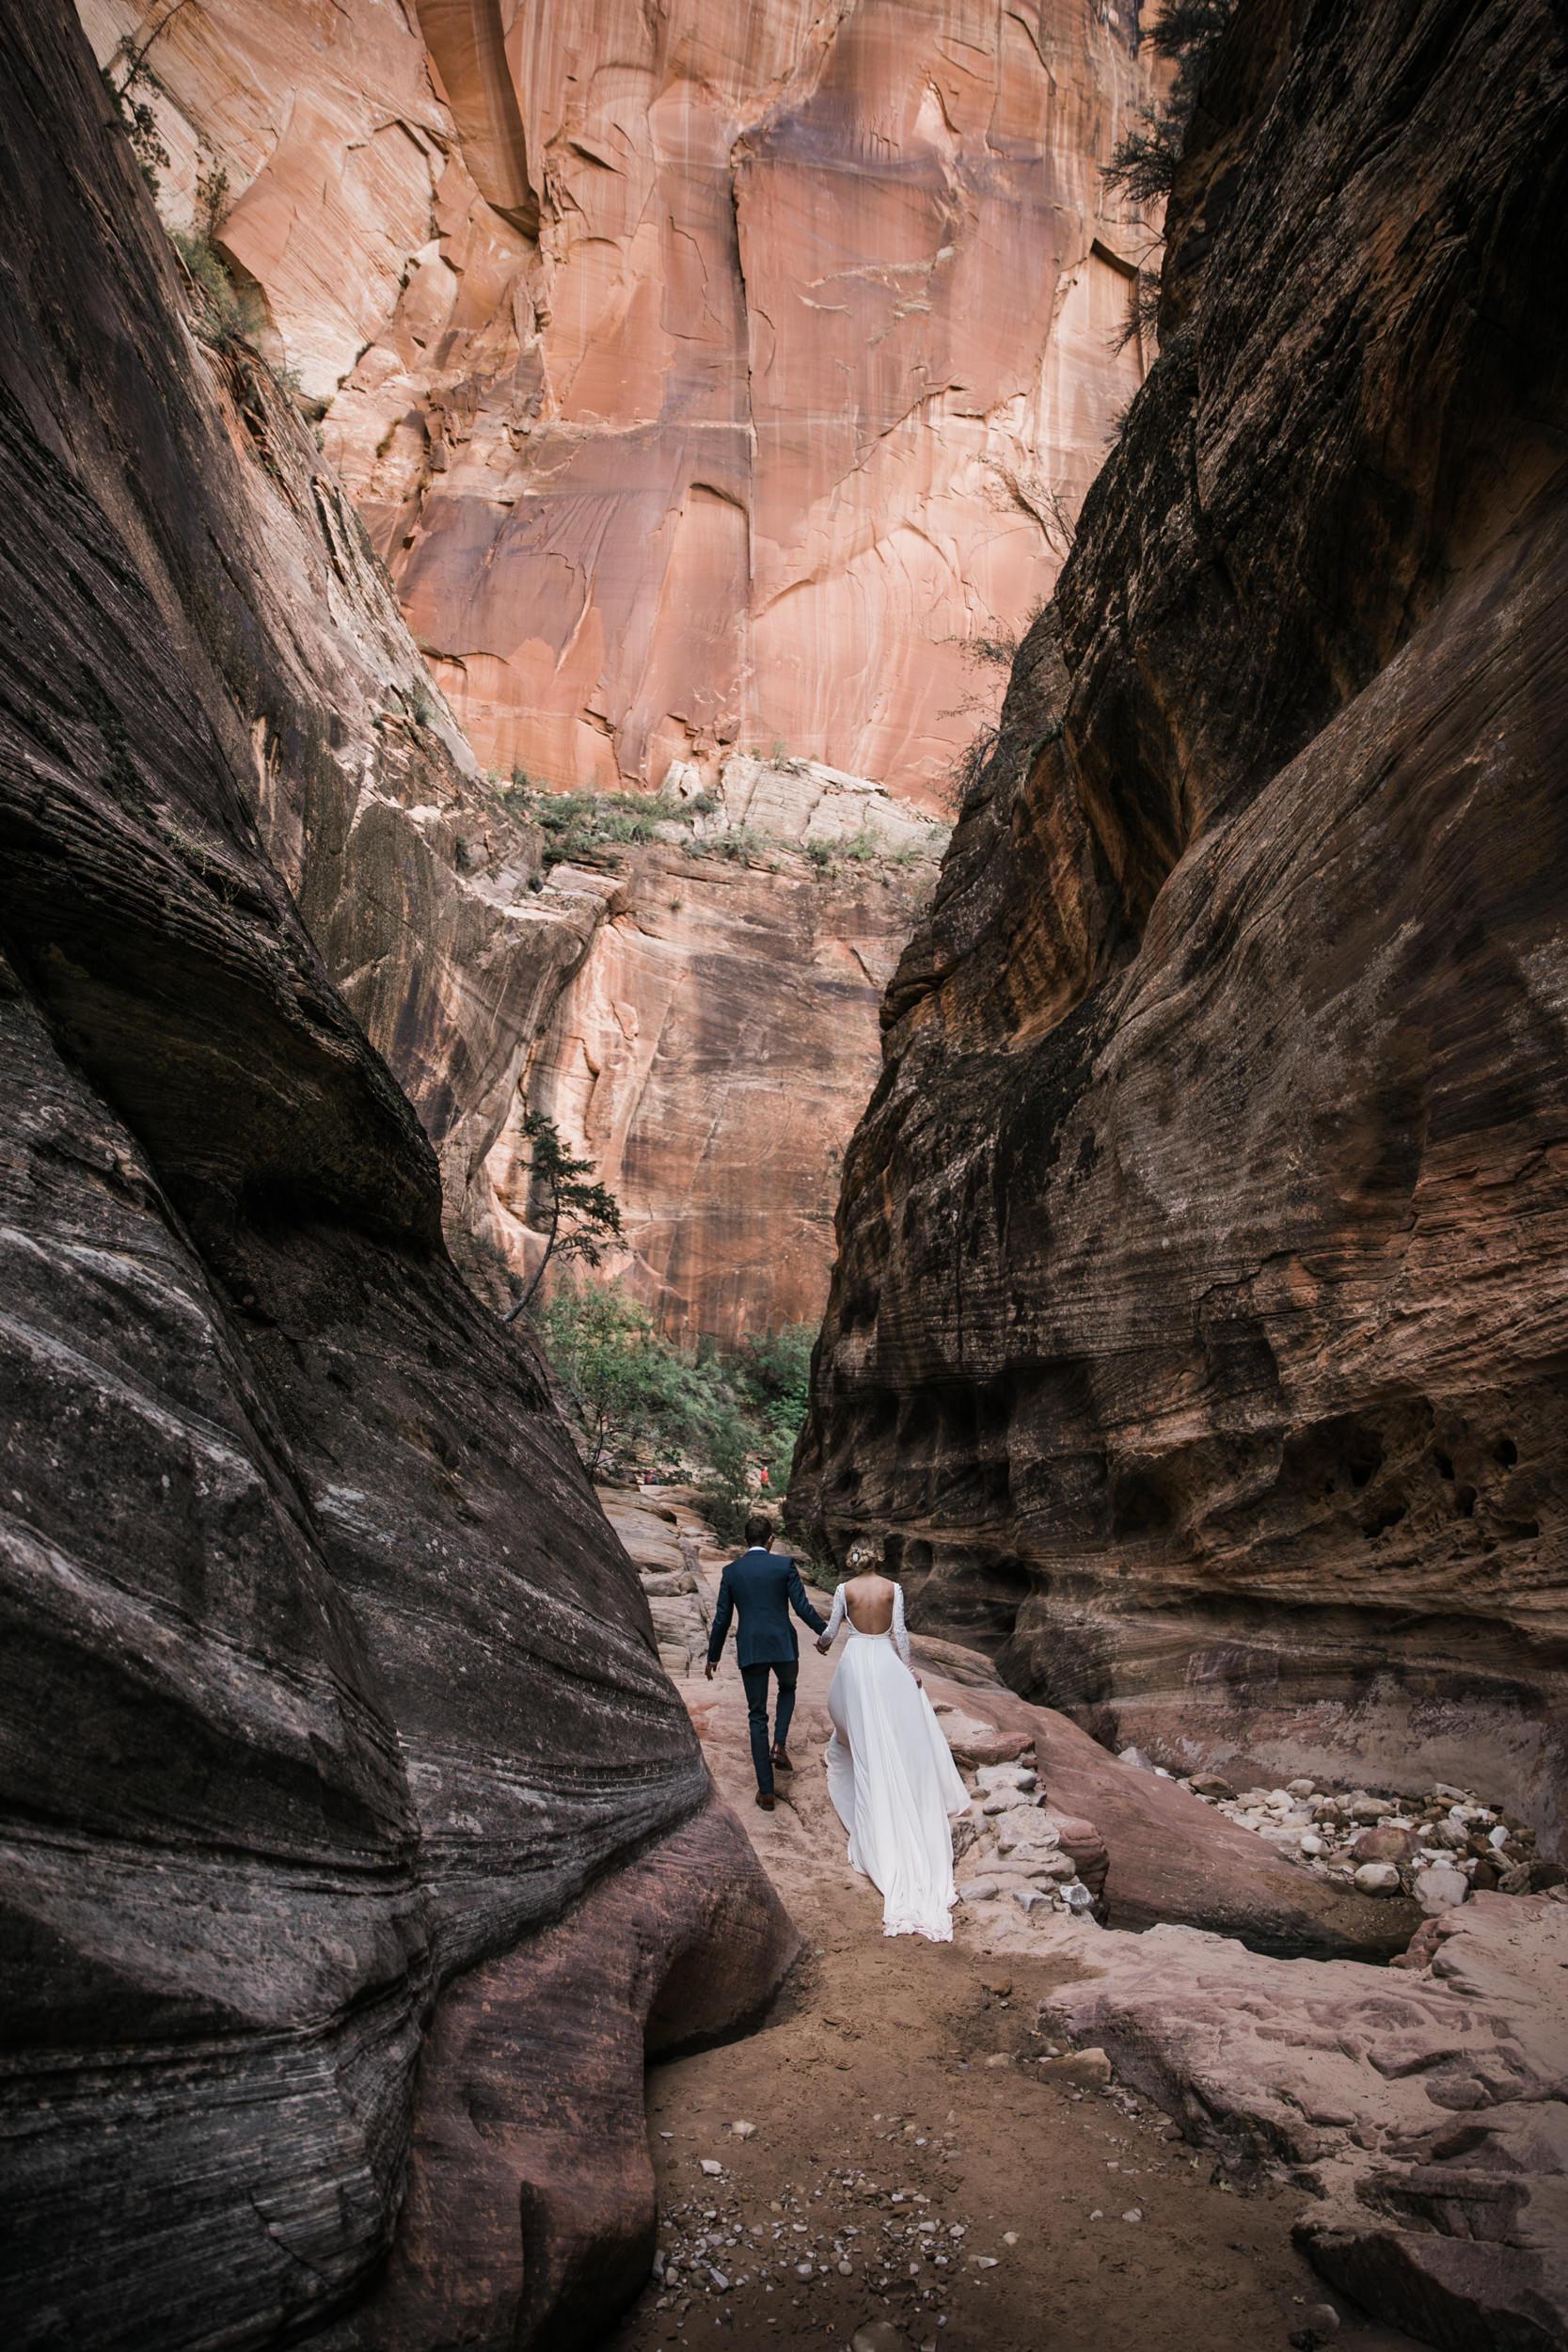 erin + marshall's sunrise elopement ceremony overlooking zion national park   hiking wedding   utah elopement photographer   the hearnes adventure photography